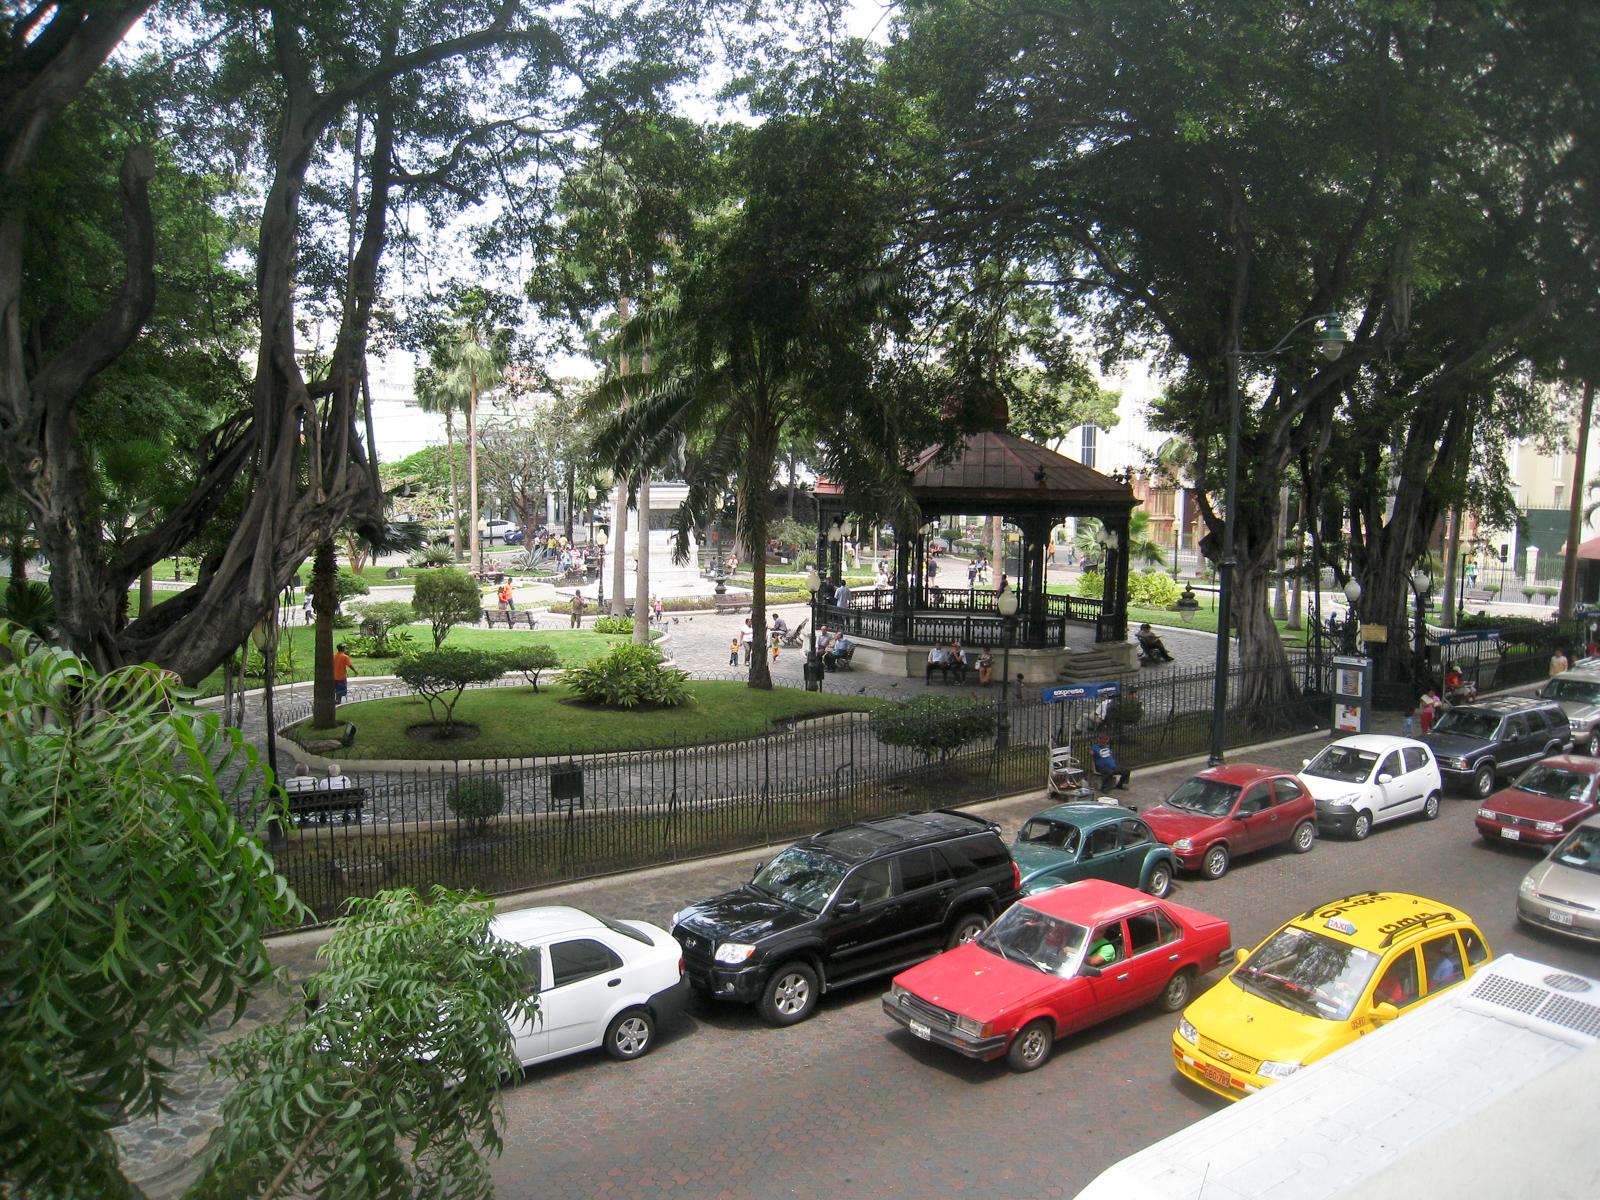 Parque Seminario (Iguana Park) in downtown Guayaquil